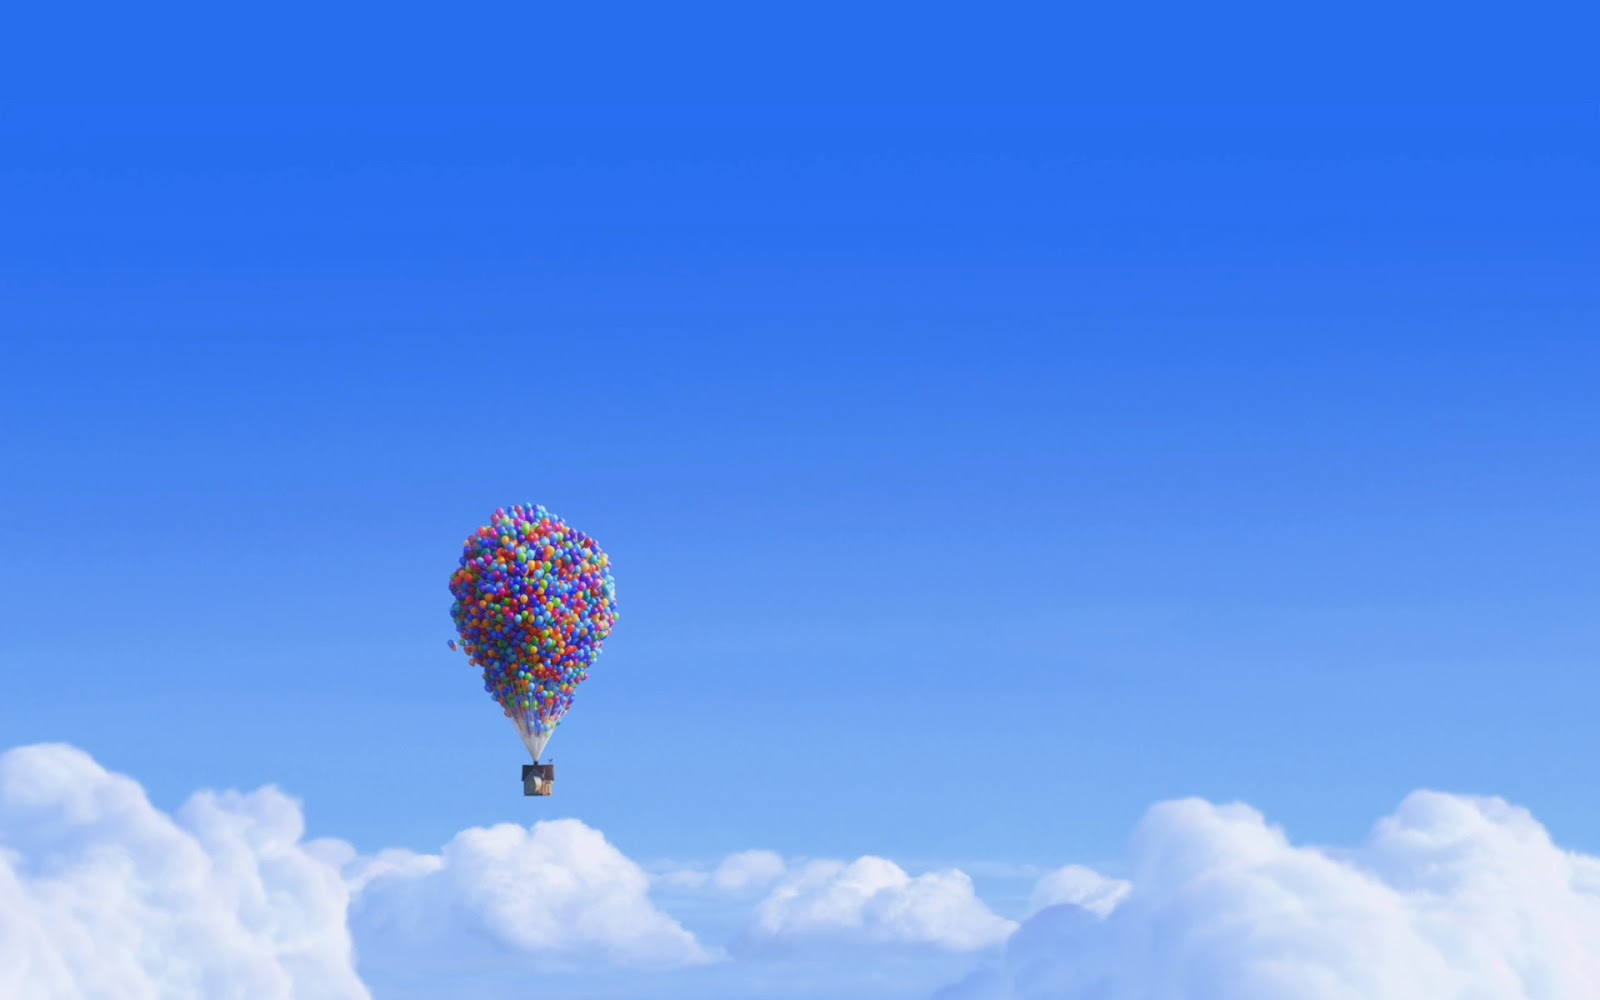 http://3.bp.blogspot.com/-blKZA_tmACU/UAN8QEGR9PI/AAAAAAAAADQ/0eV60CZ7yBk/s1600/blue_pixar_movies_floating_houses_up_movie_balloons_balloon_house_desktop_1920x1200_wallpaper-59944.jpg